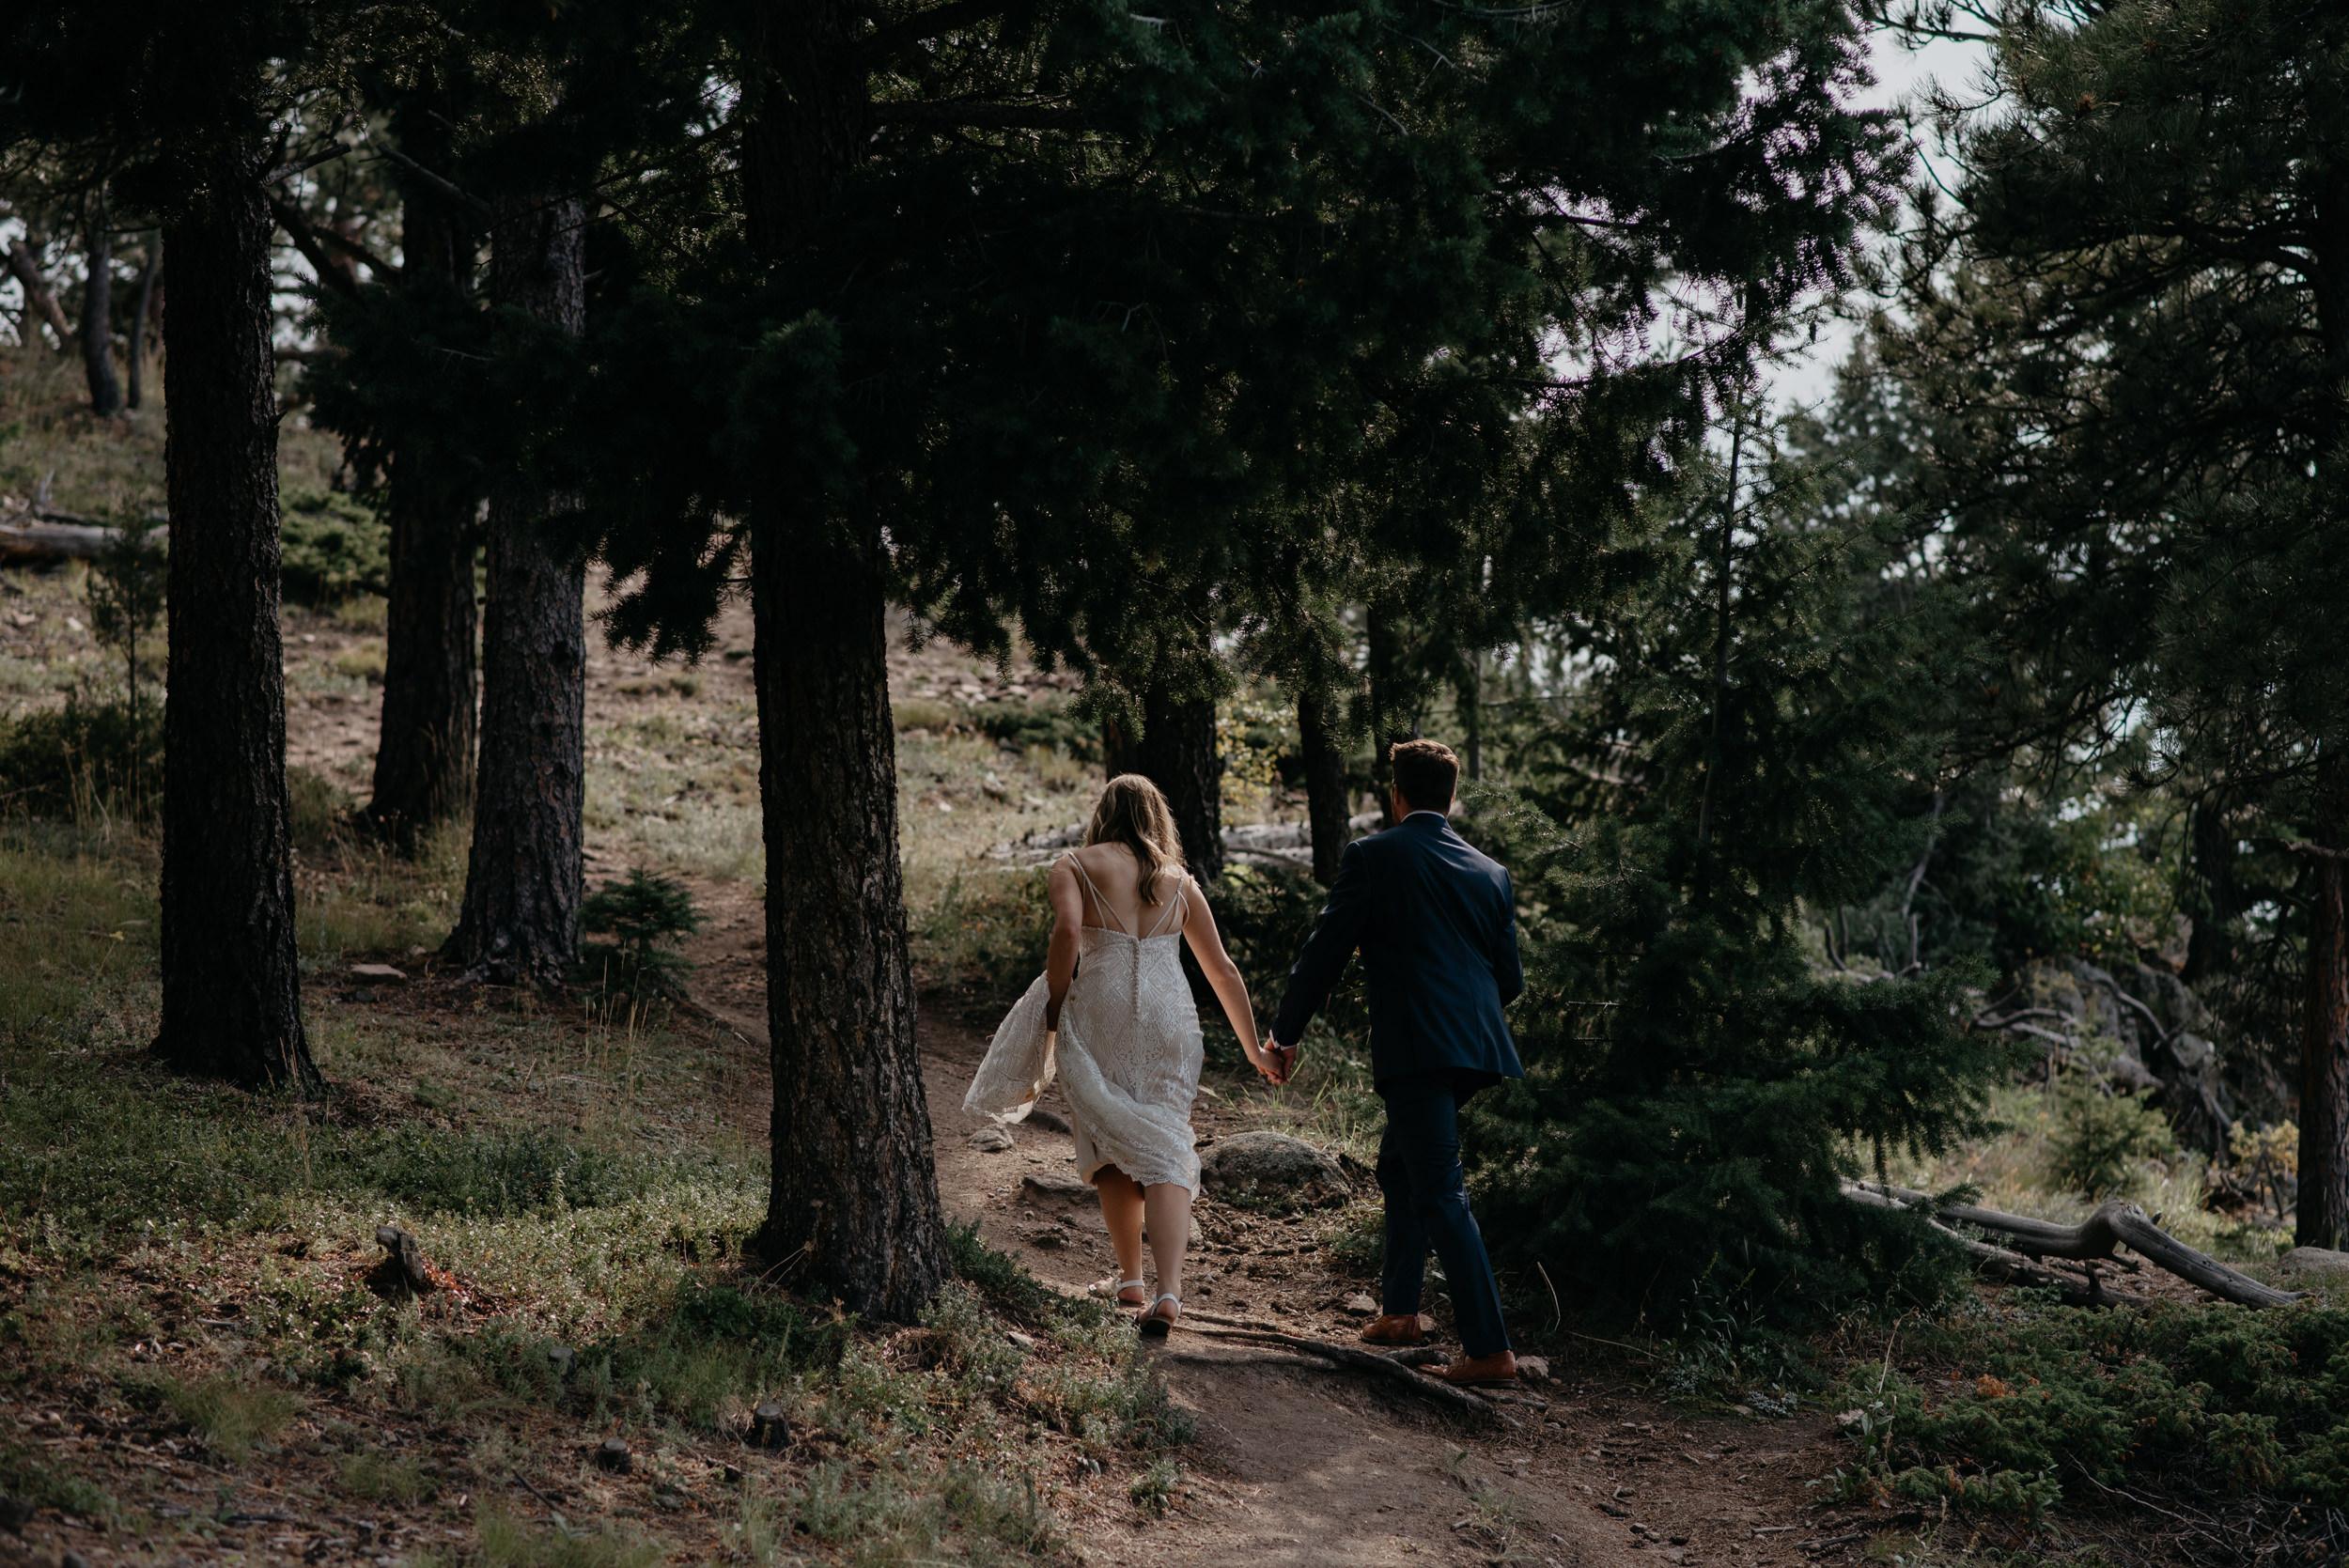 Boulder adventure elopement photographer. Colorado wedding at Lost Gulch.